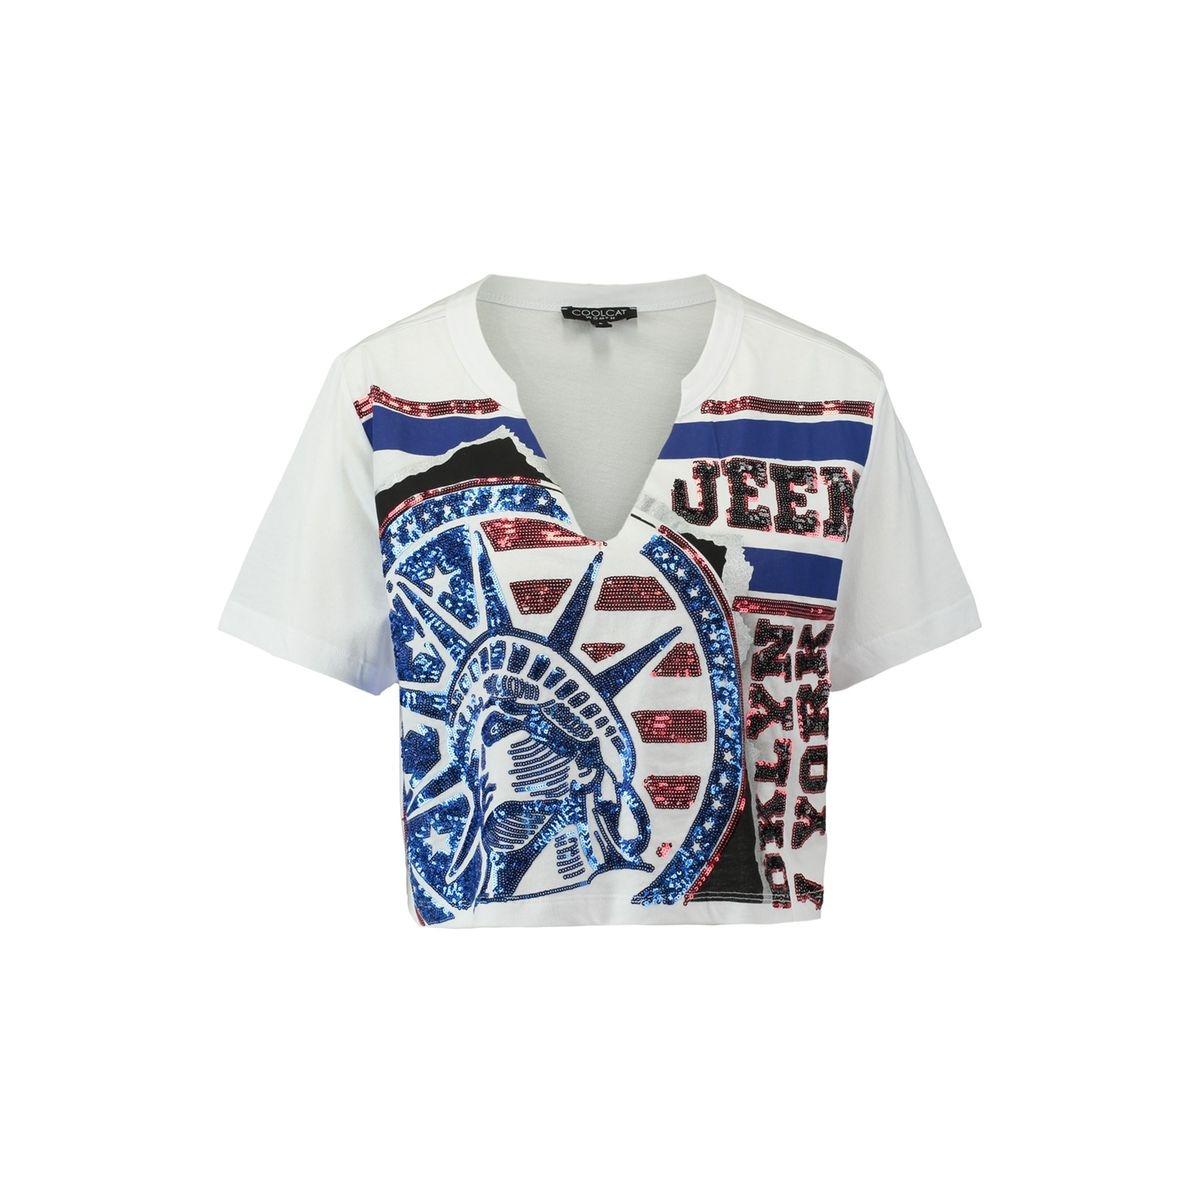 T-shirt Eamerica